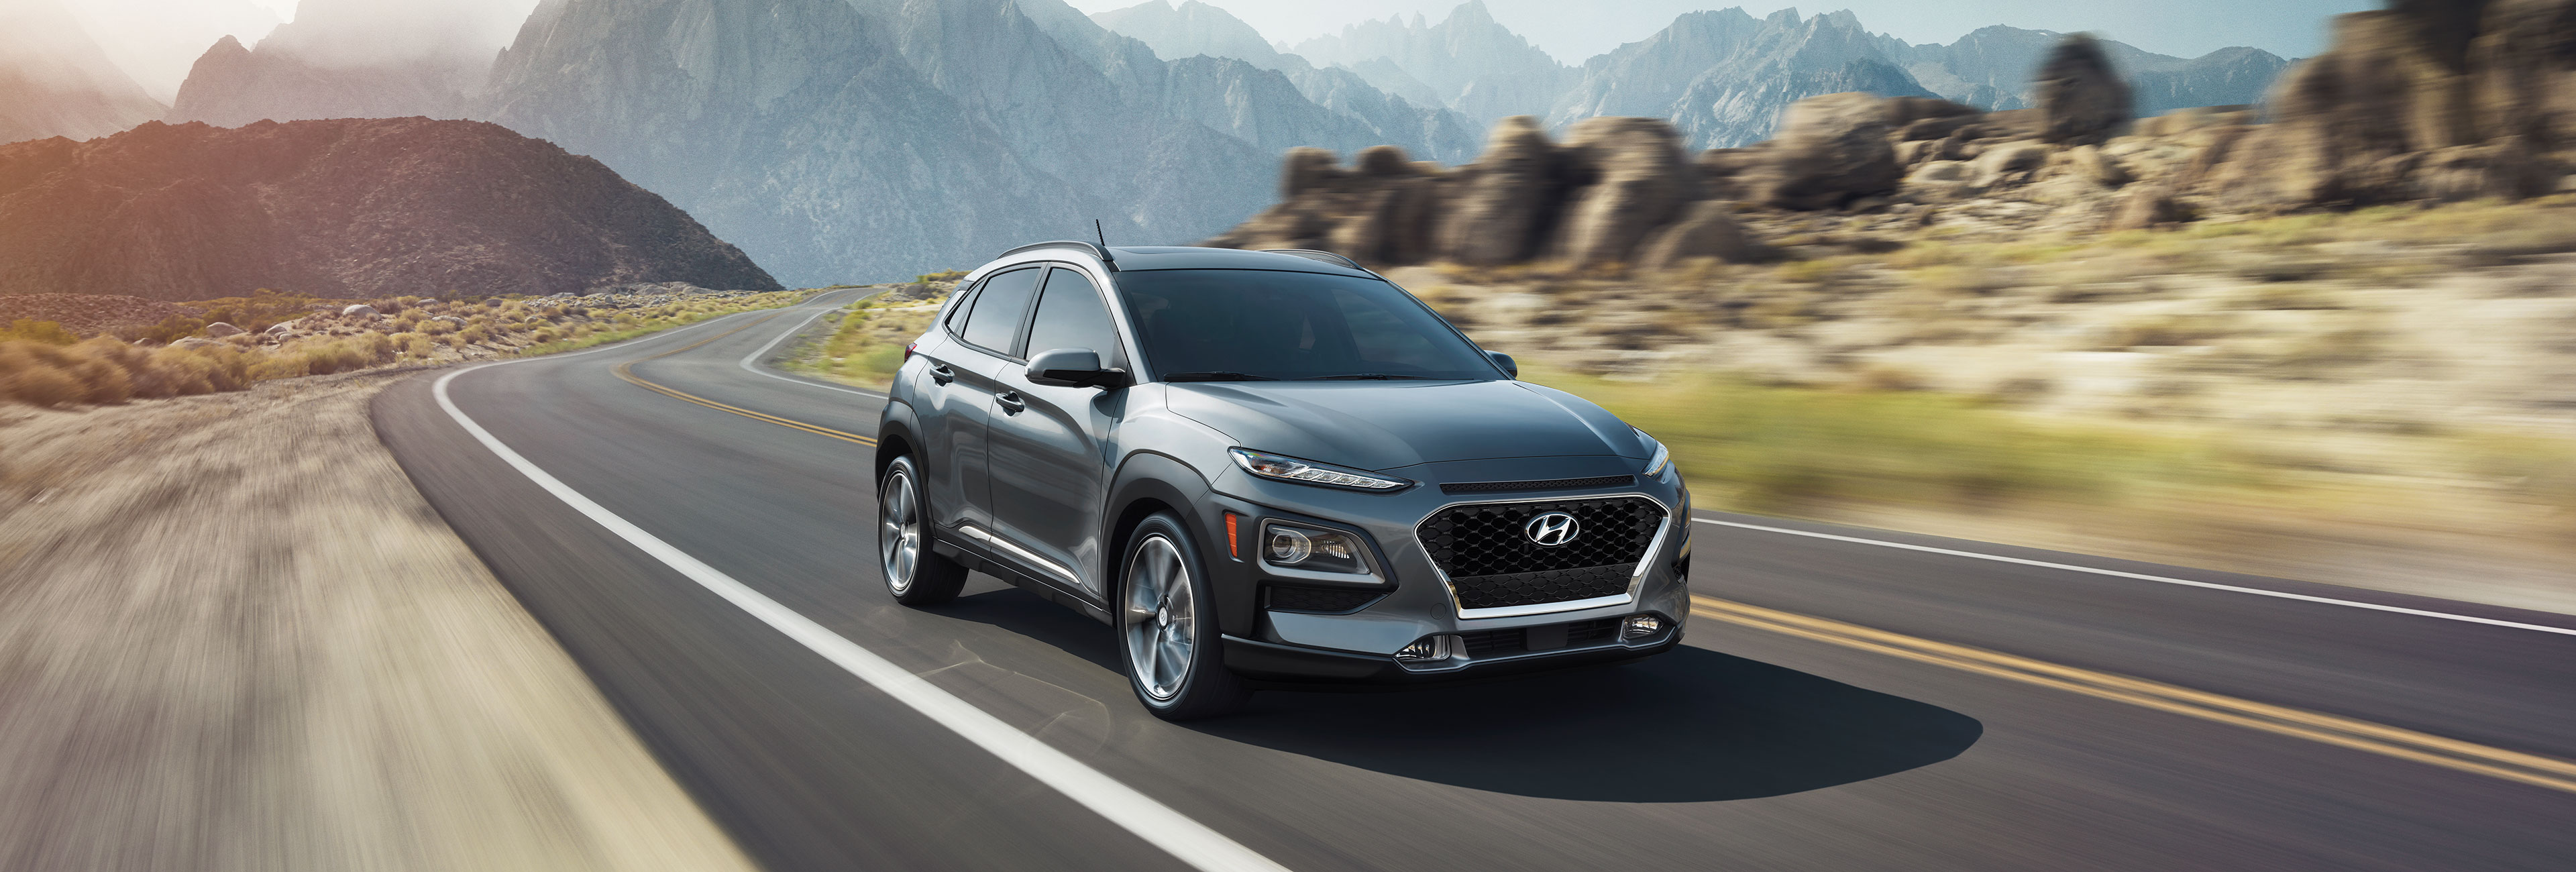 2018 Hyundai KONA petitive parison vs Mazda CX 3 GT AWD vs